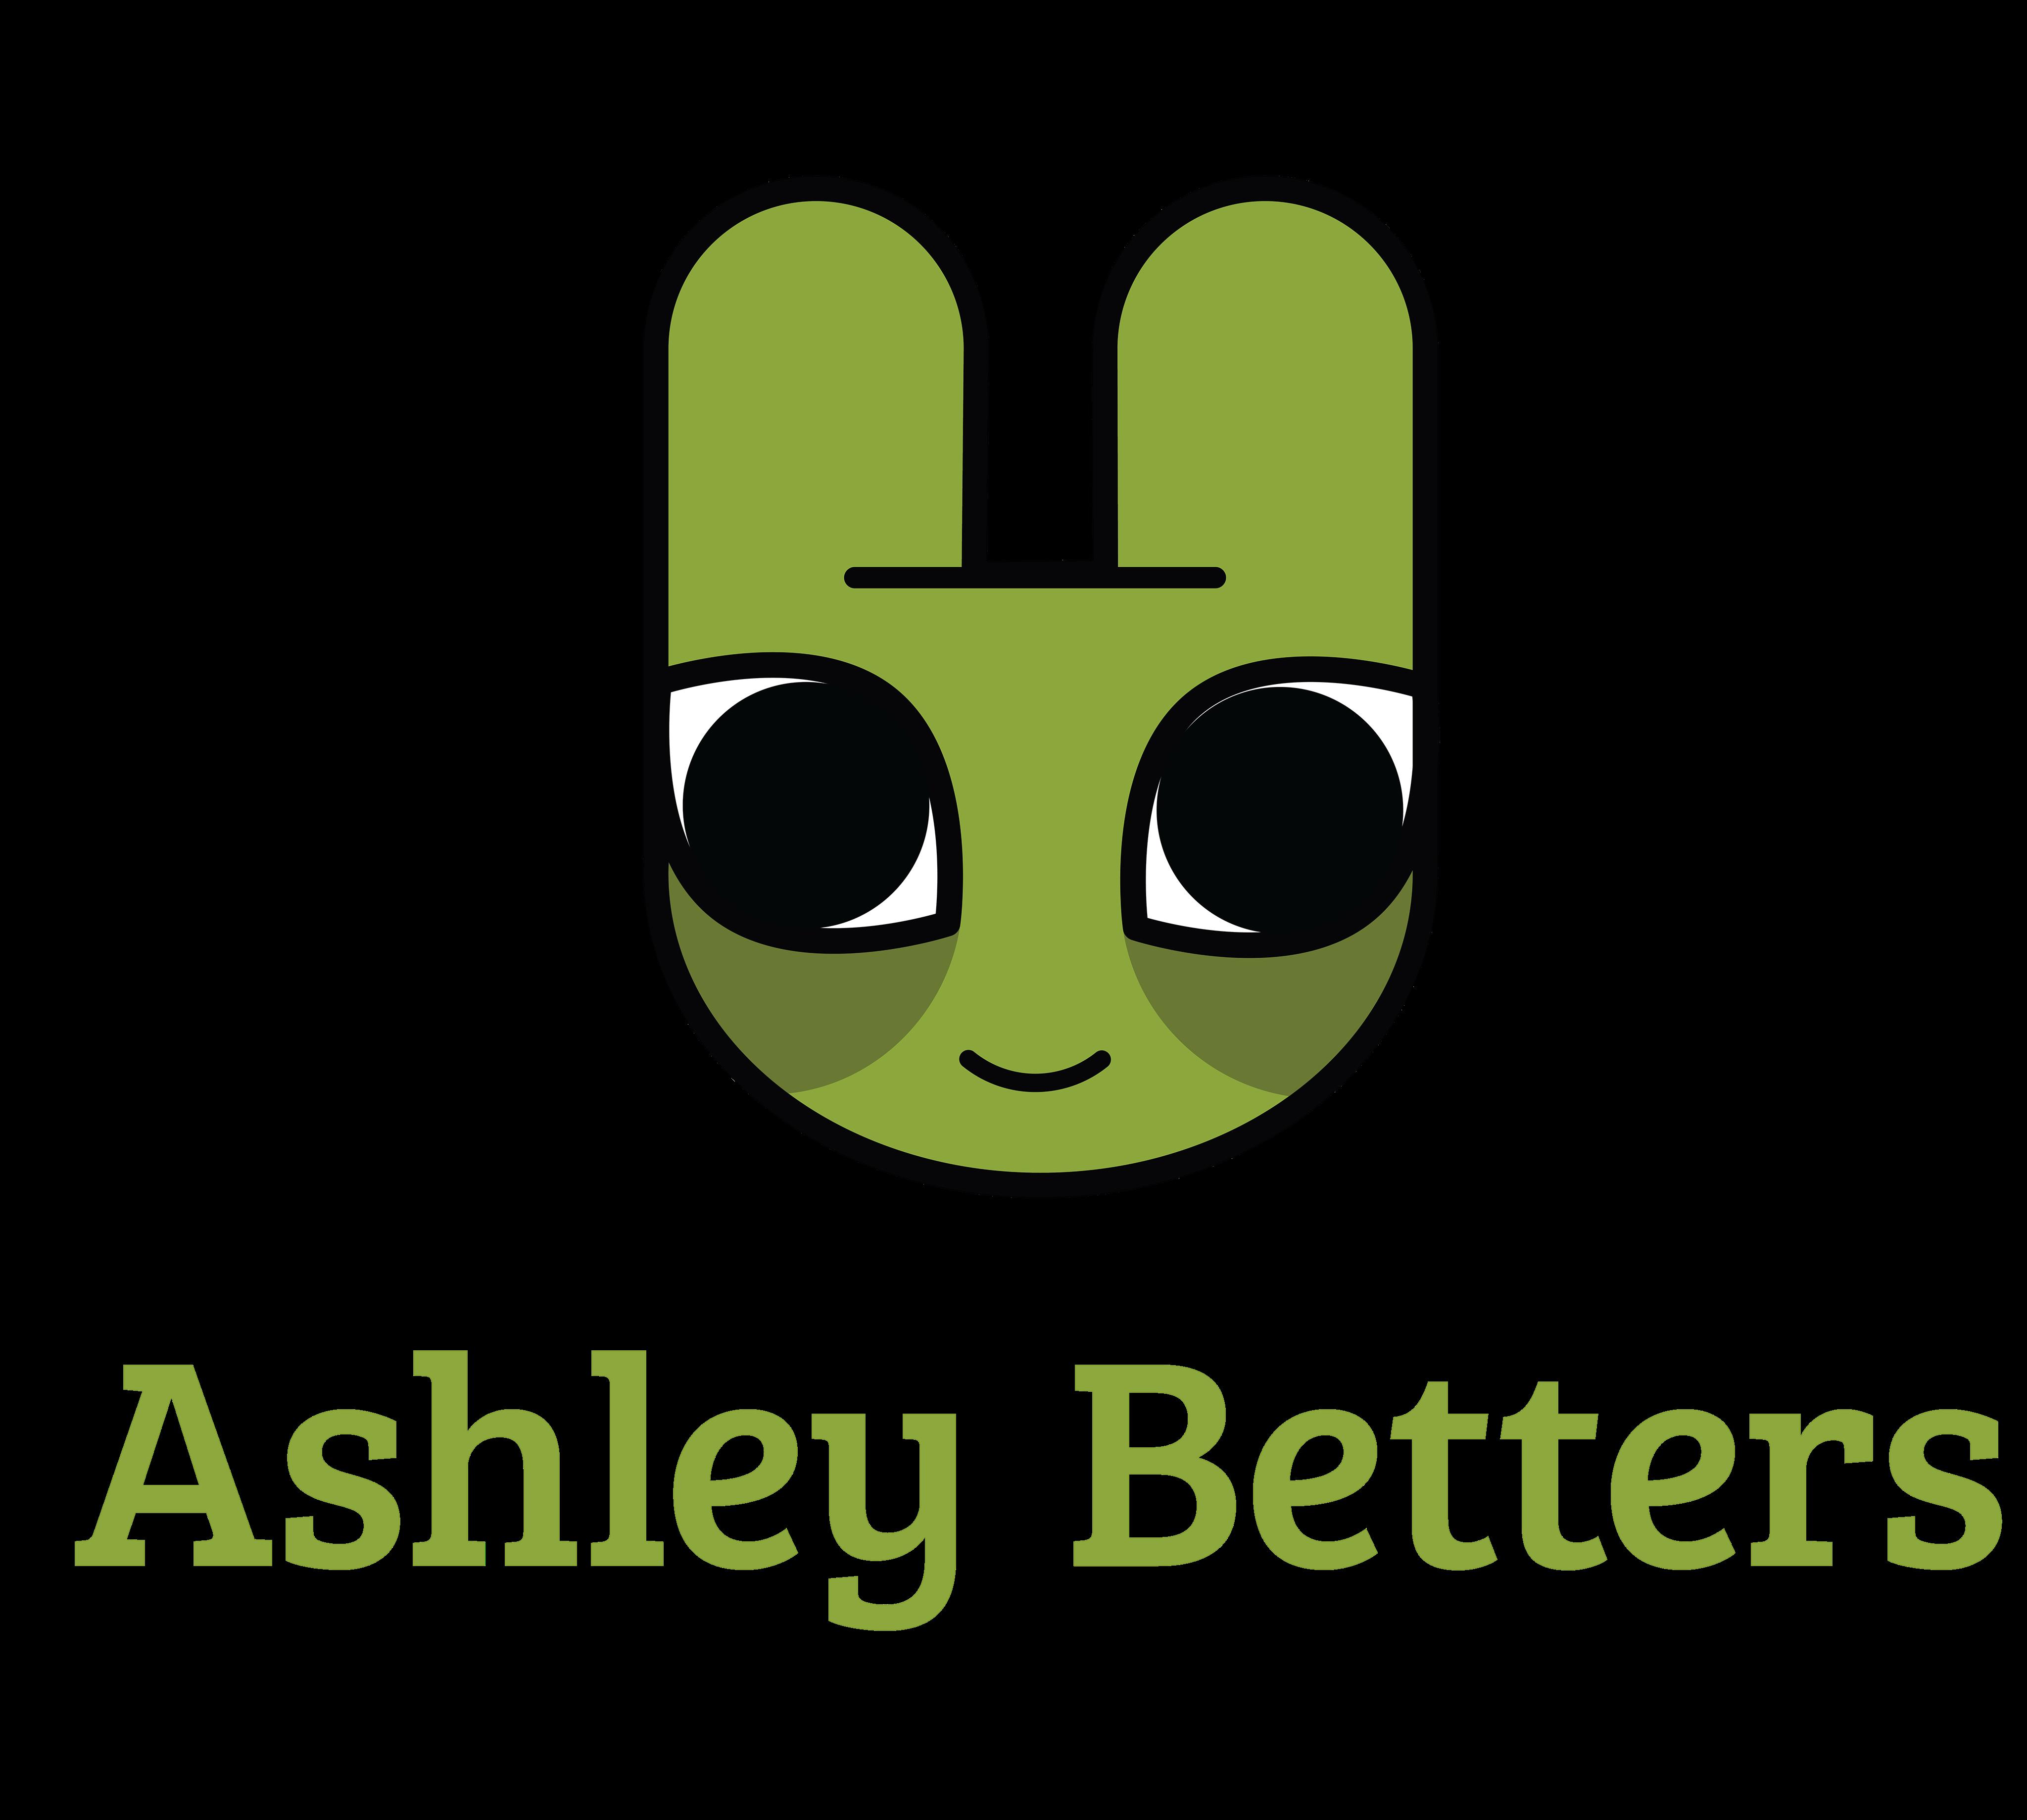 ashley betters